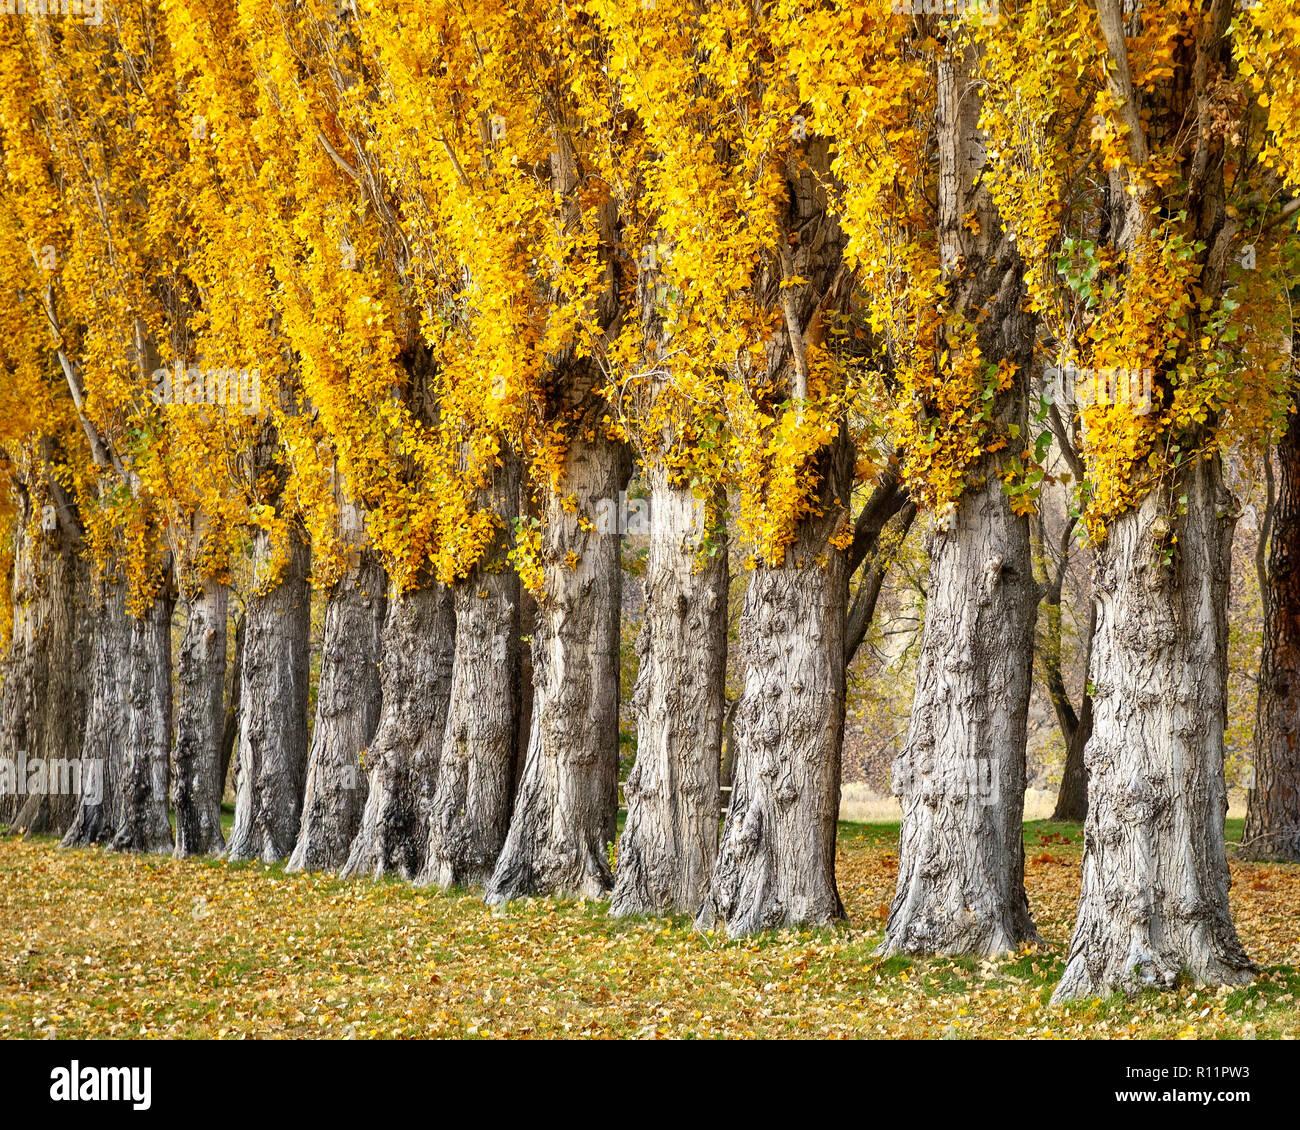 Poplar Trees, Columbia Hills State Park at Horsethief Lake Campground, Columbia River Gorge, Washington. - Stock Image